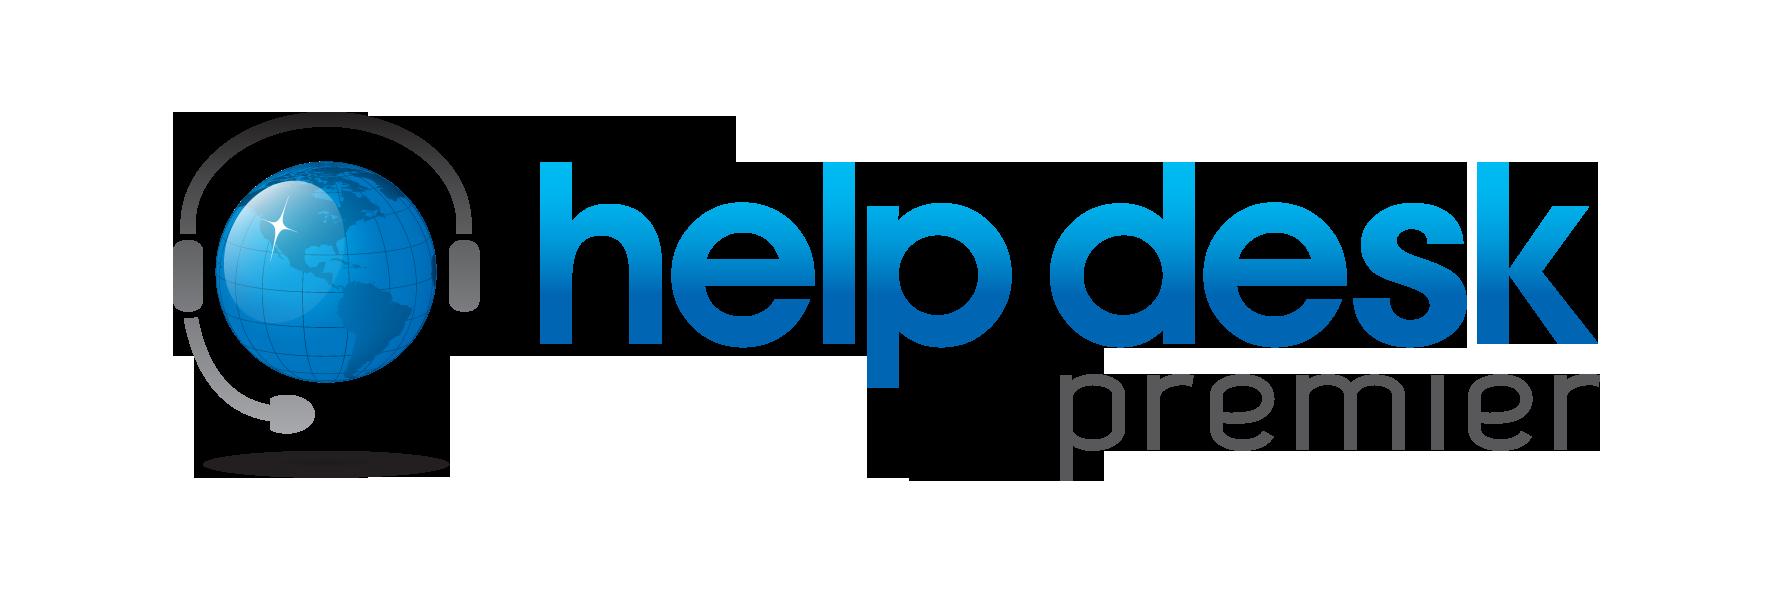 Brightbox Solutions Creators Of Help Desk Premier Secures 500 000